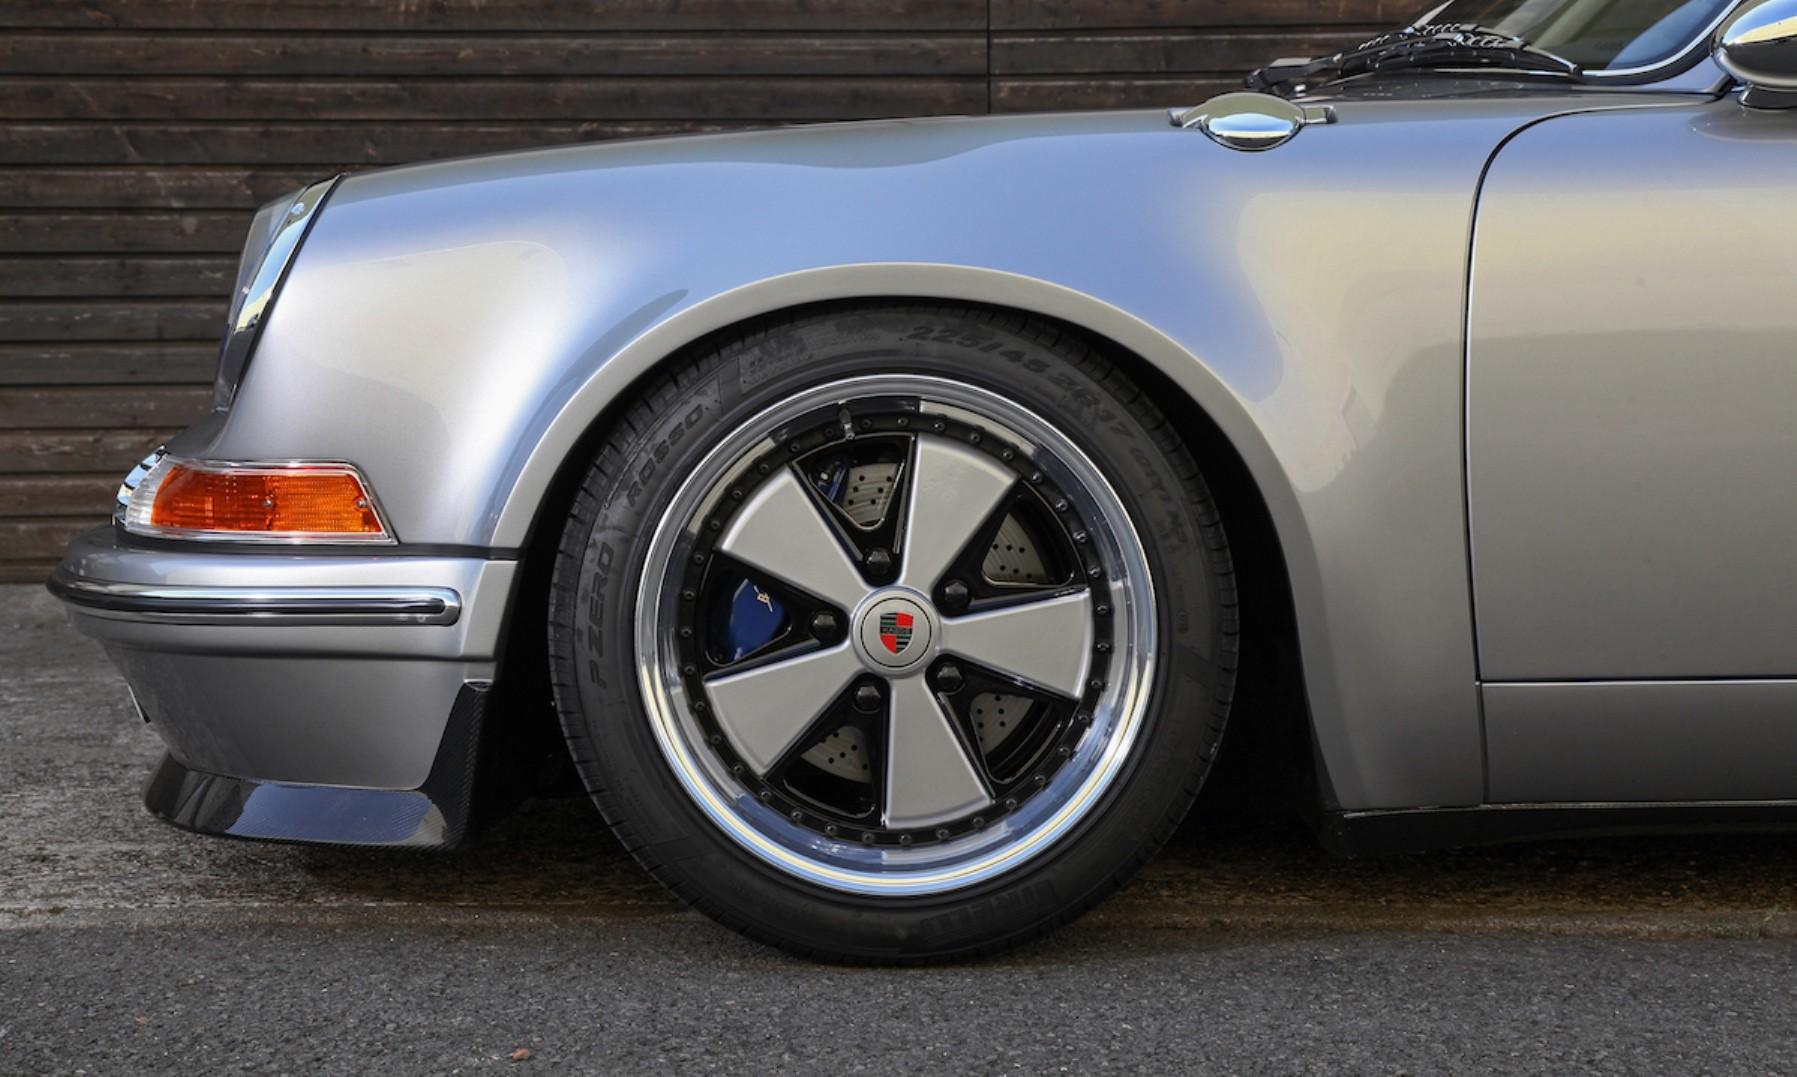 Kaege Retro Porsche front wheel